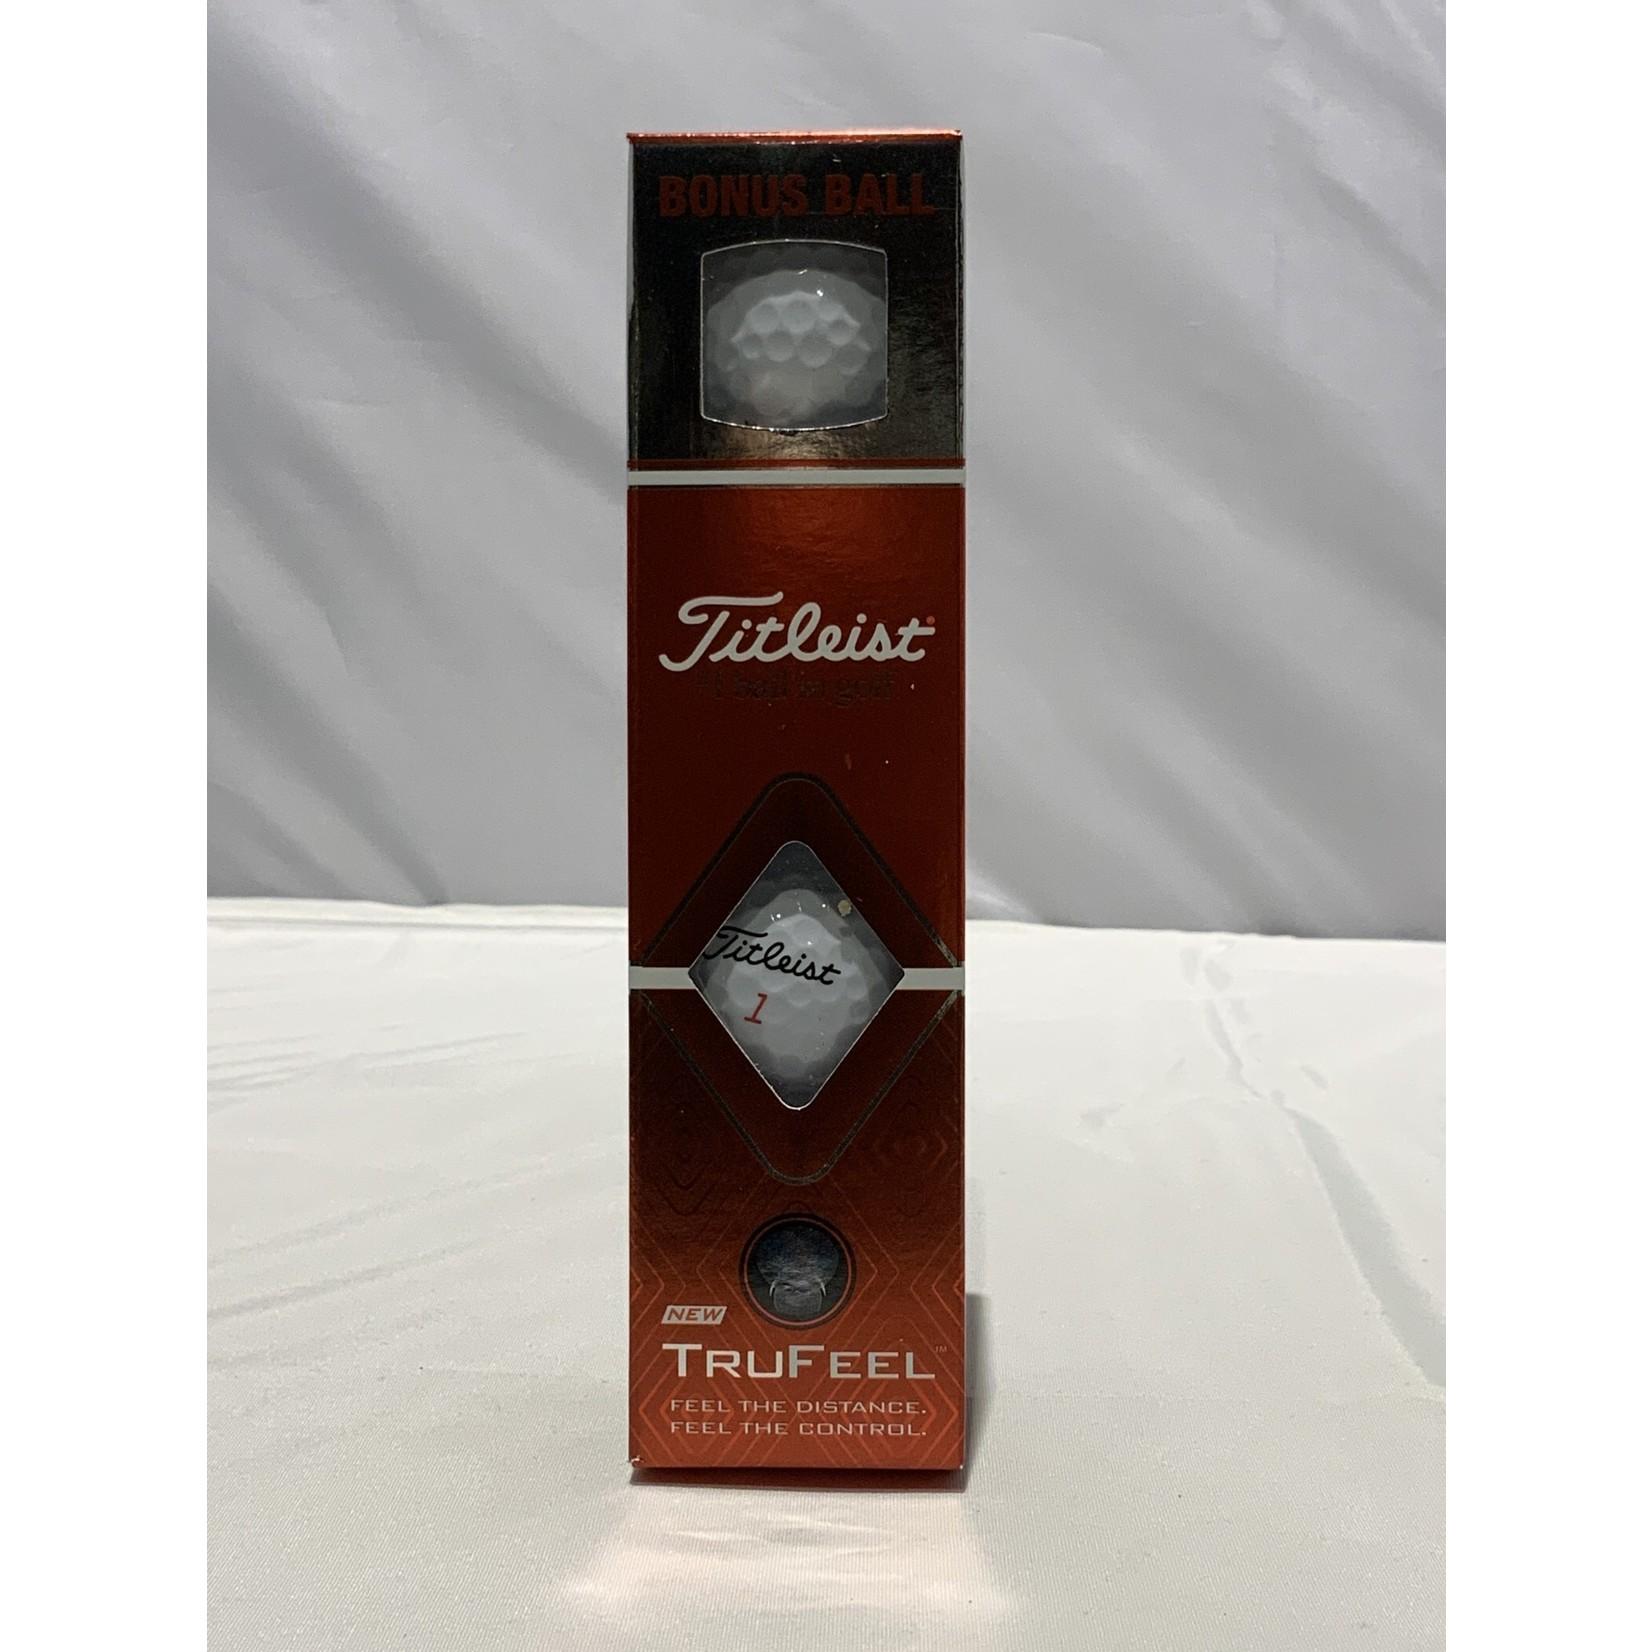 Titleist Titleist TruFeel bonus ball